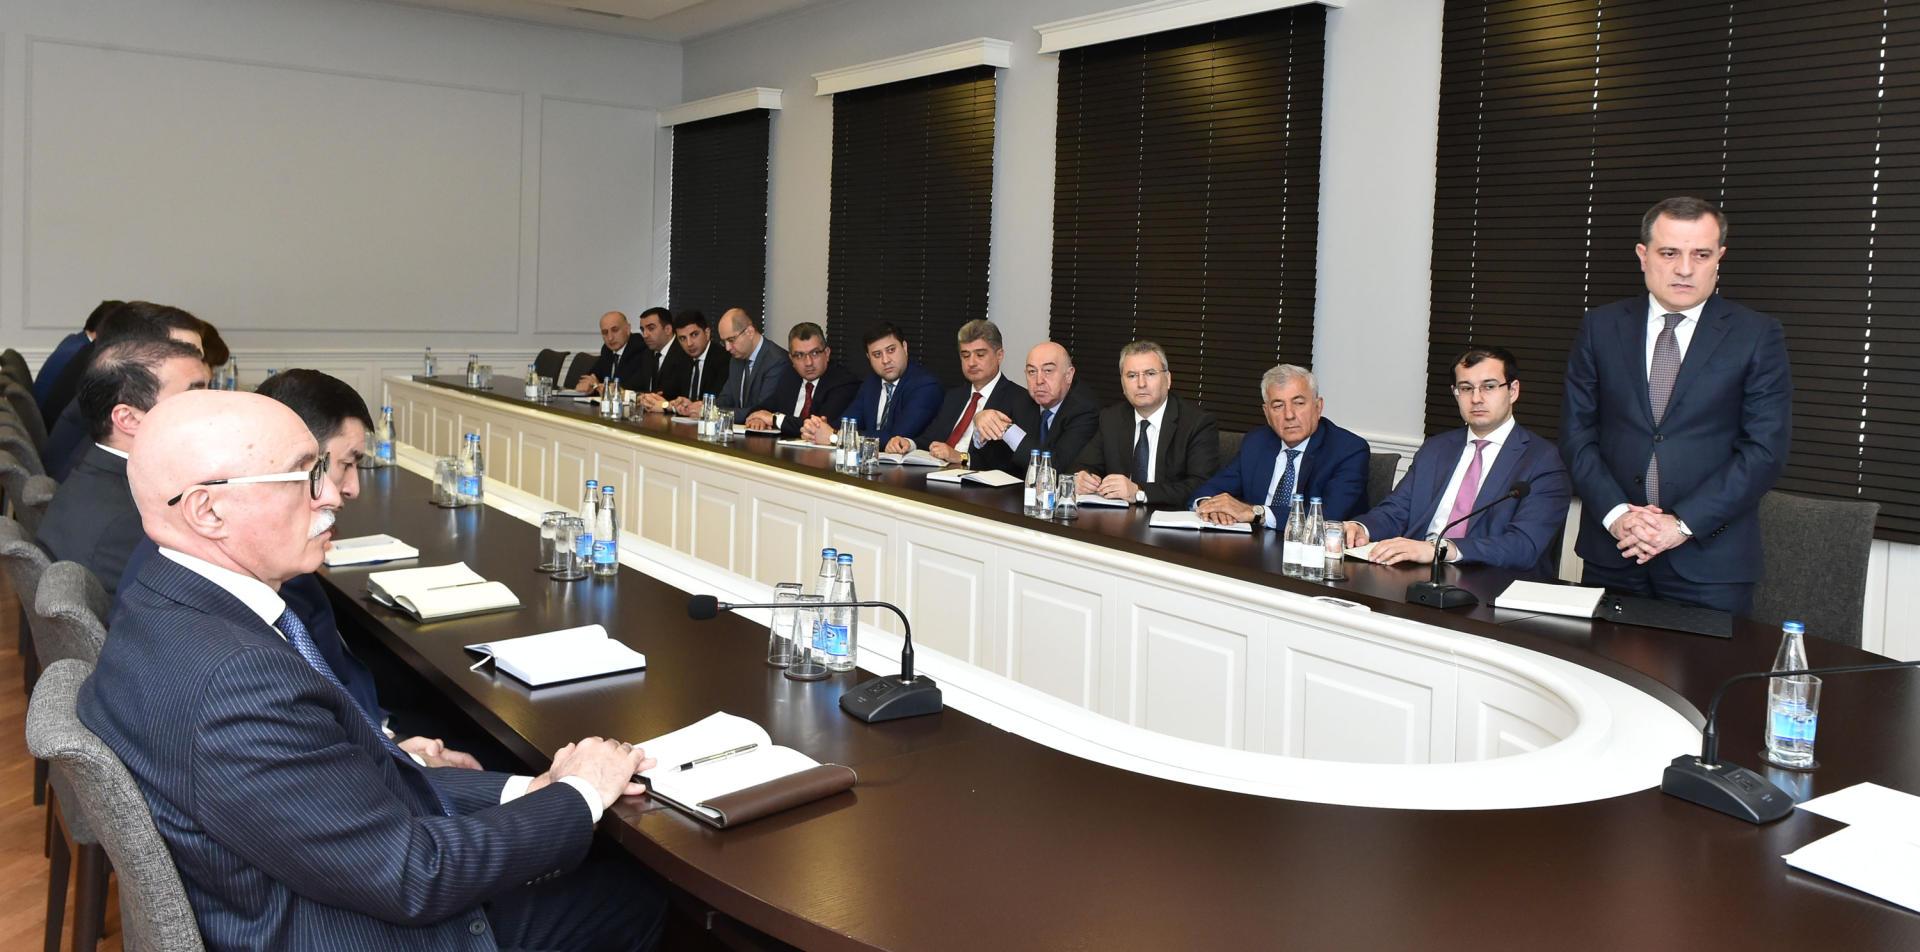 Azerbaijani Presidential Administration head introduces new education minister (PHOTO)